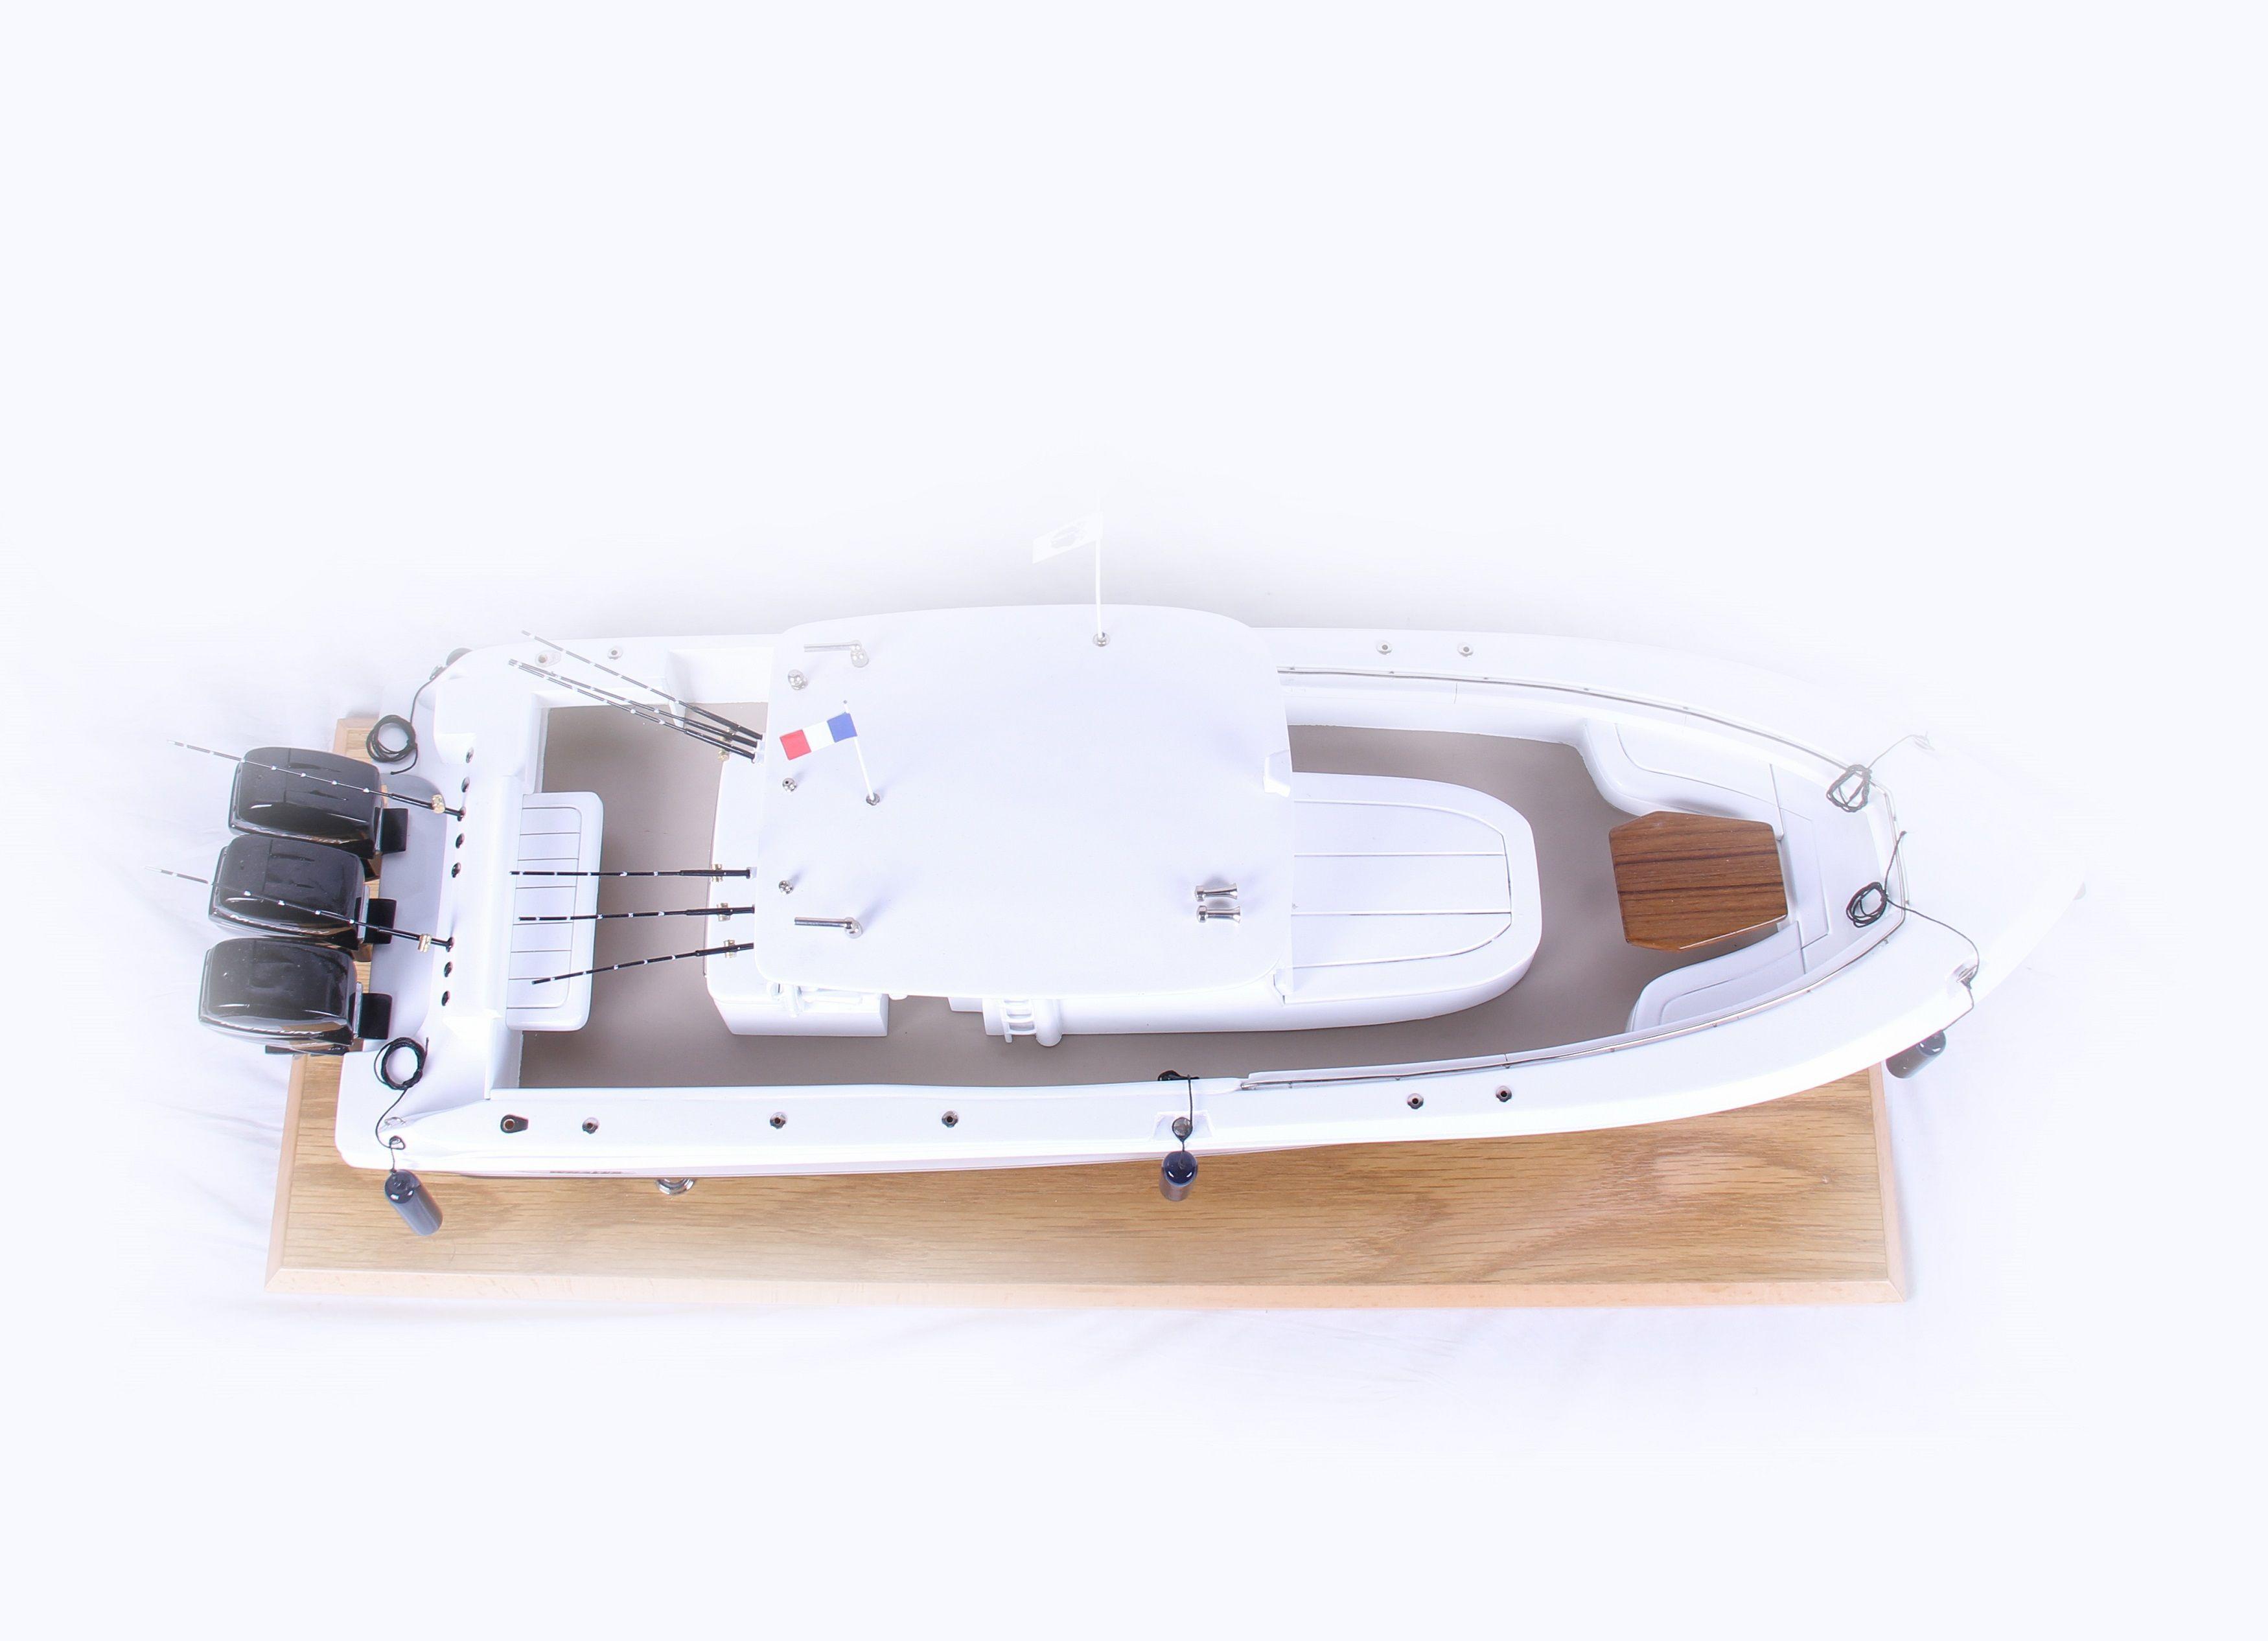 1686-9527-Boston-Whaler-Outrage-370-Model-Boat